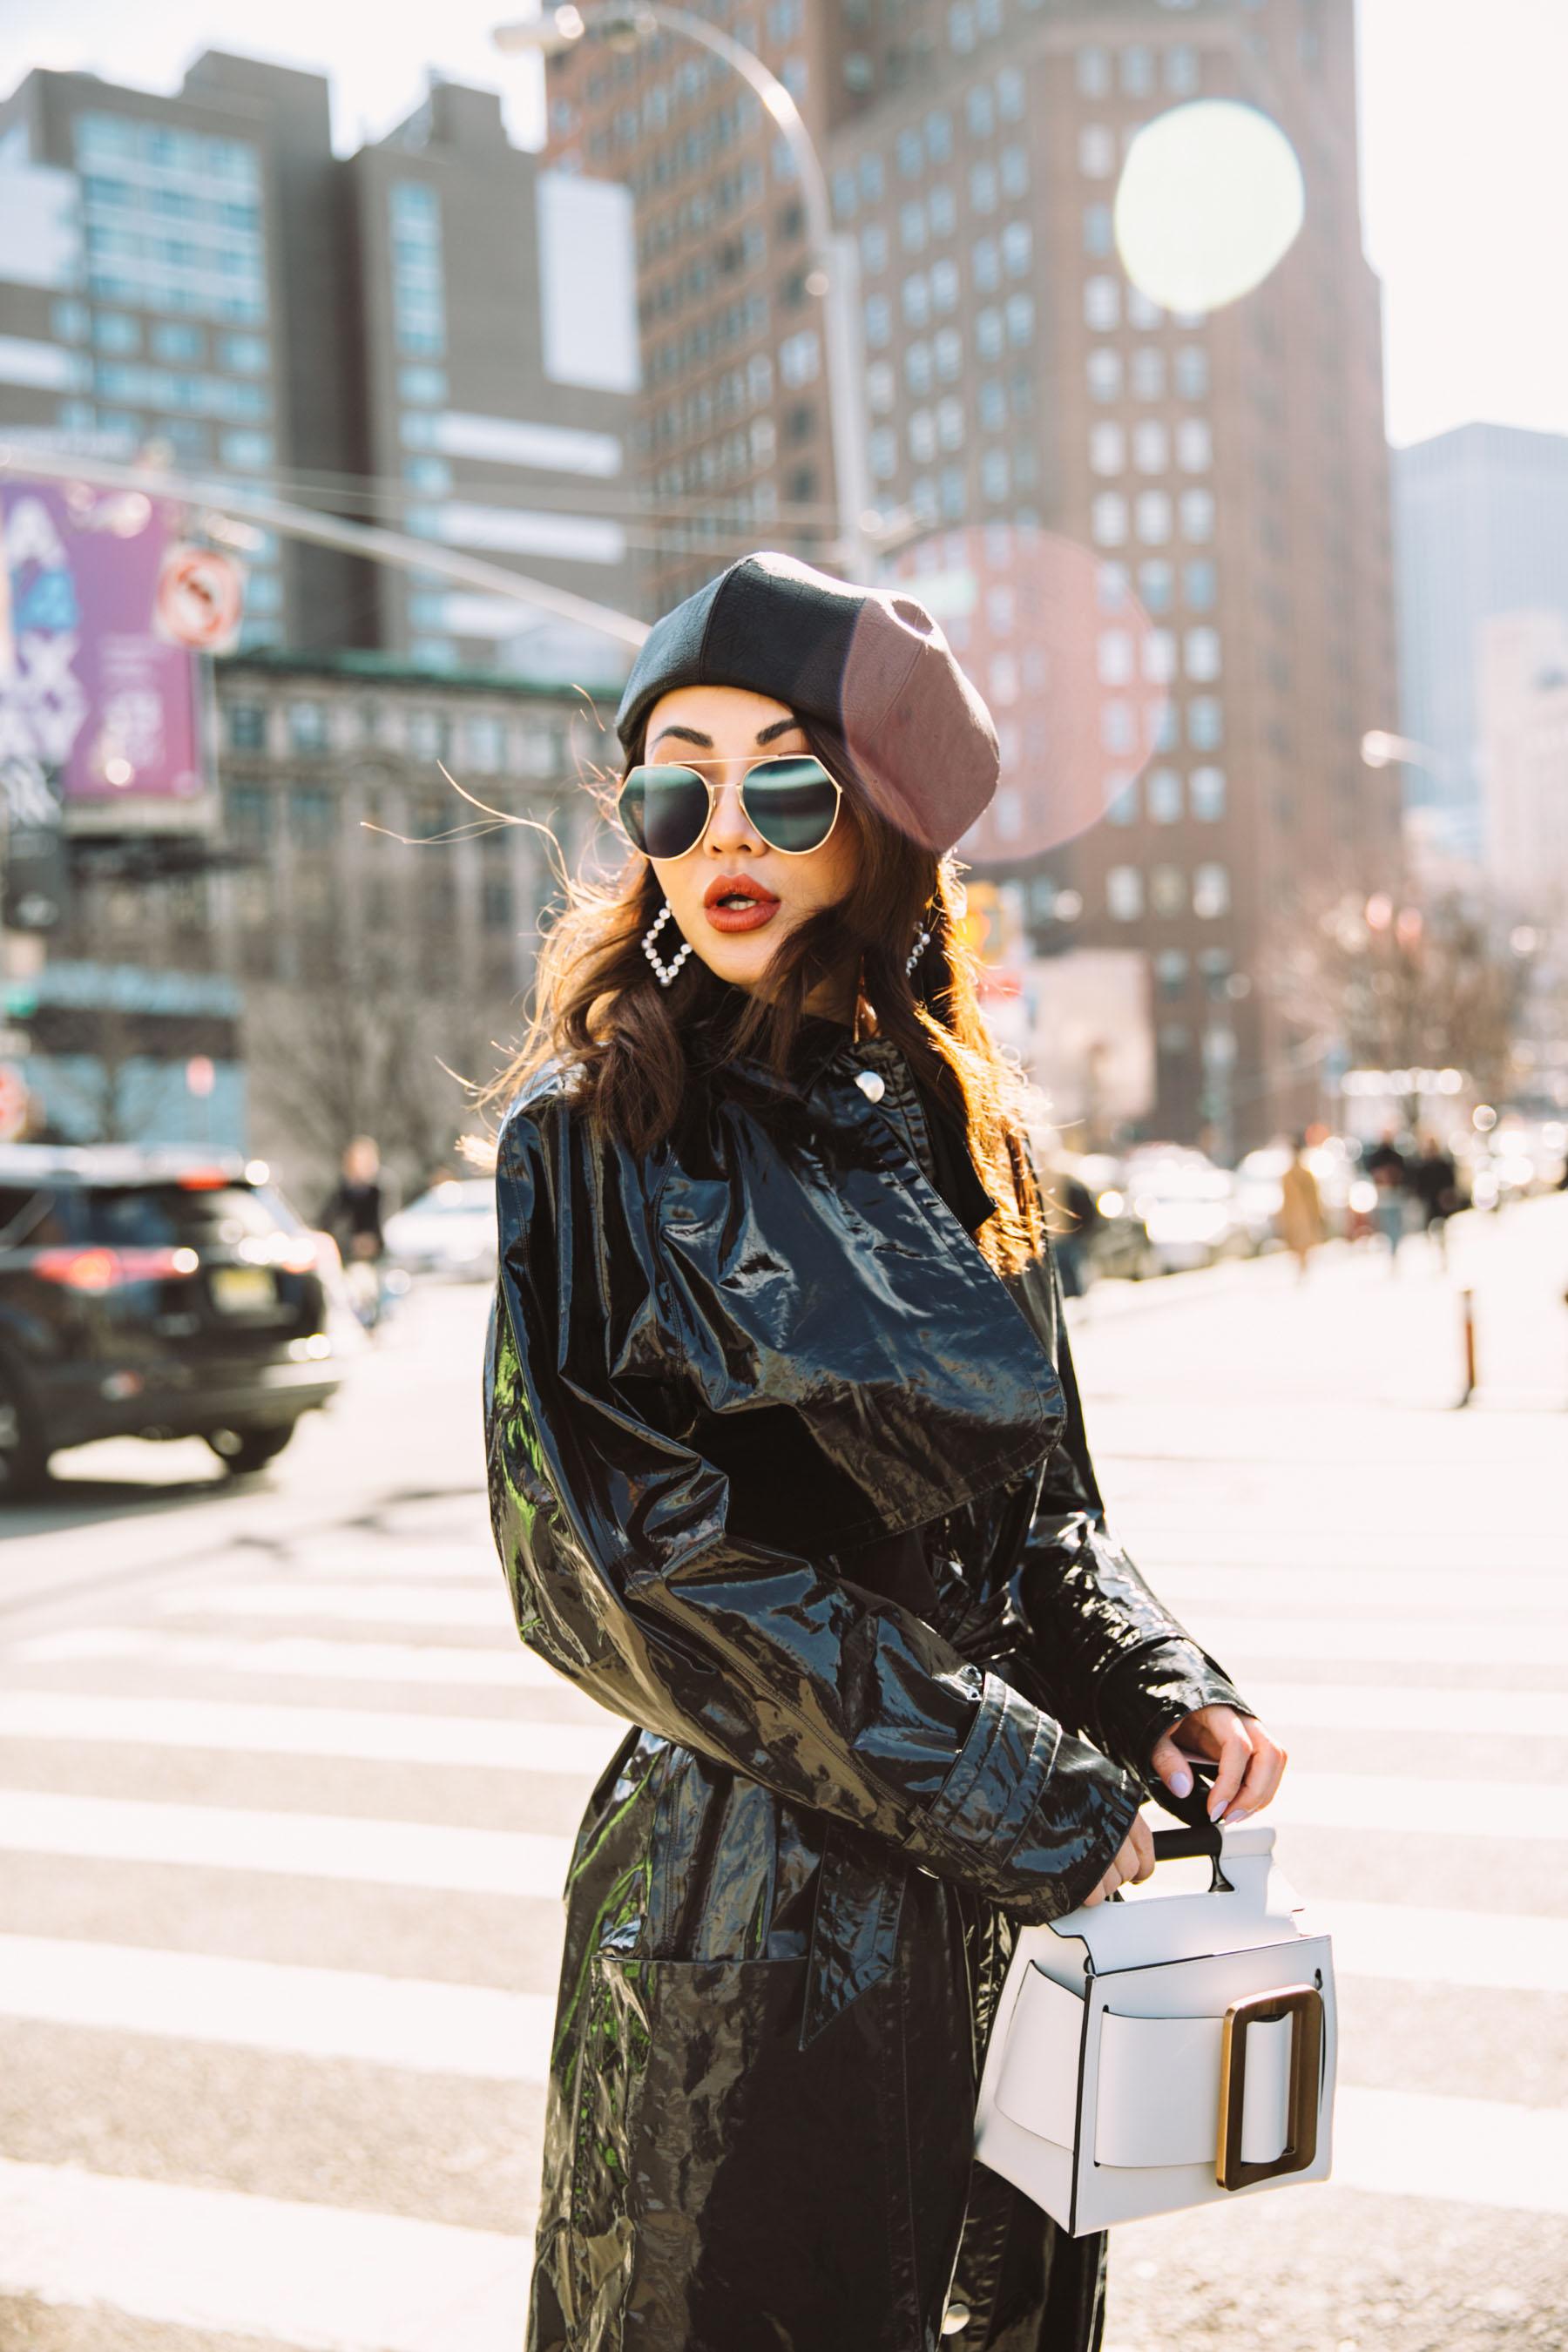 How to Wear Vinyl - Vinyl Trench Coat, NYFW Street Style // Notjessfashion.com